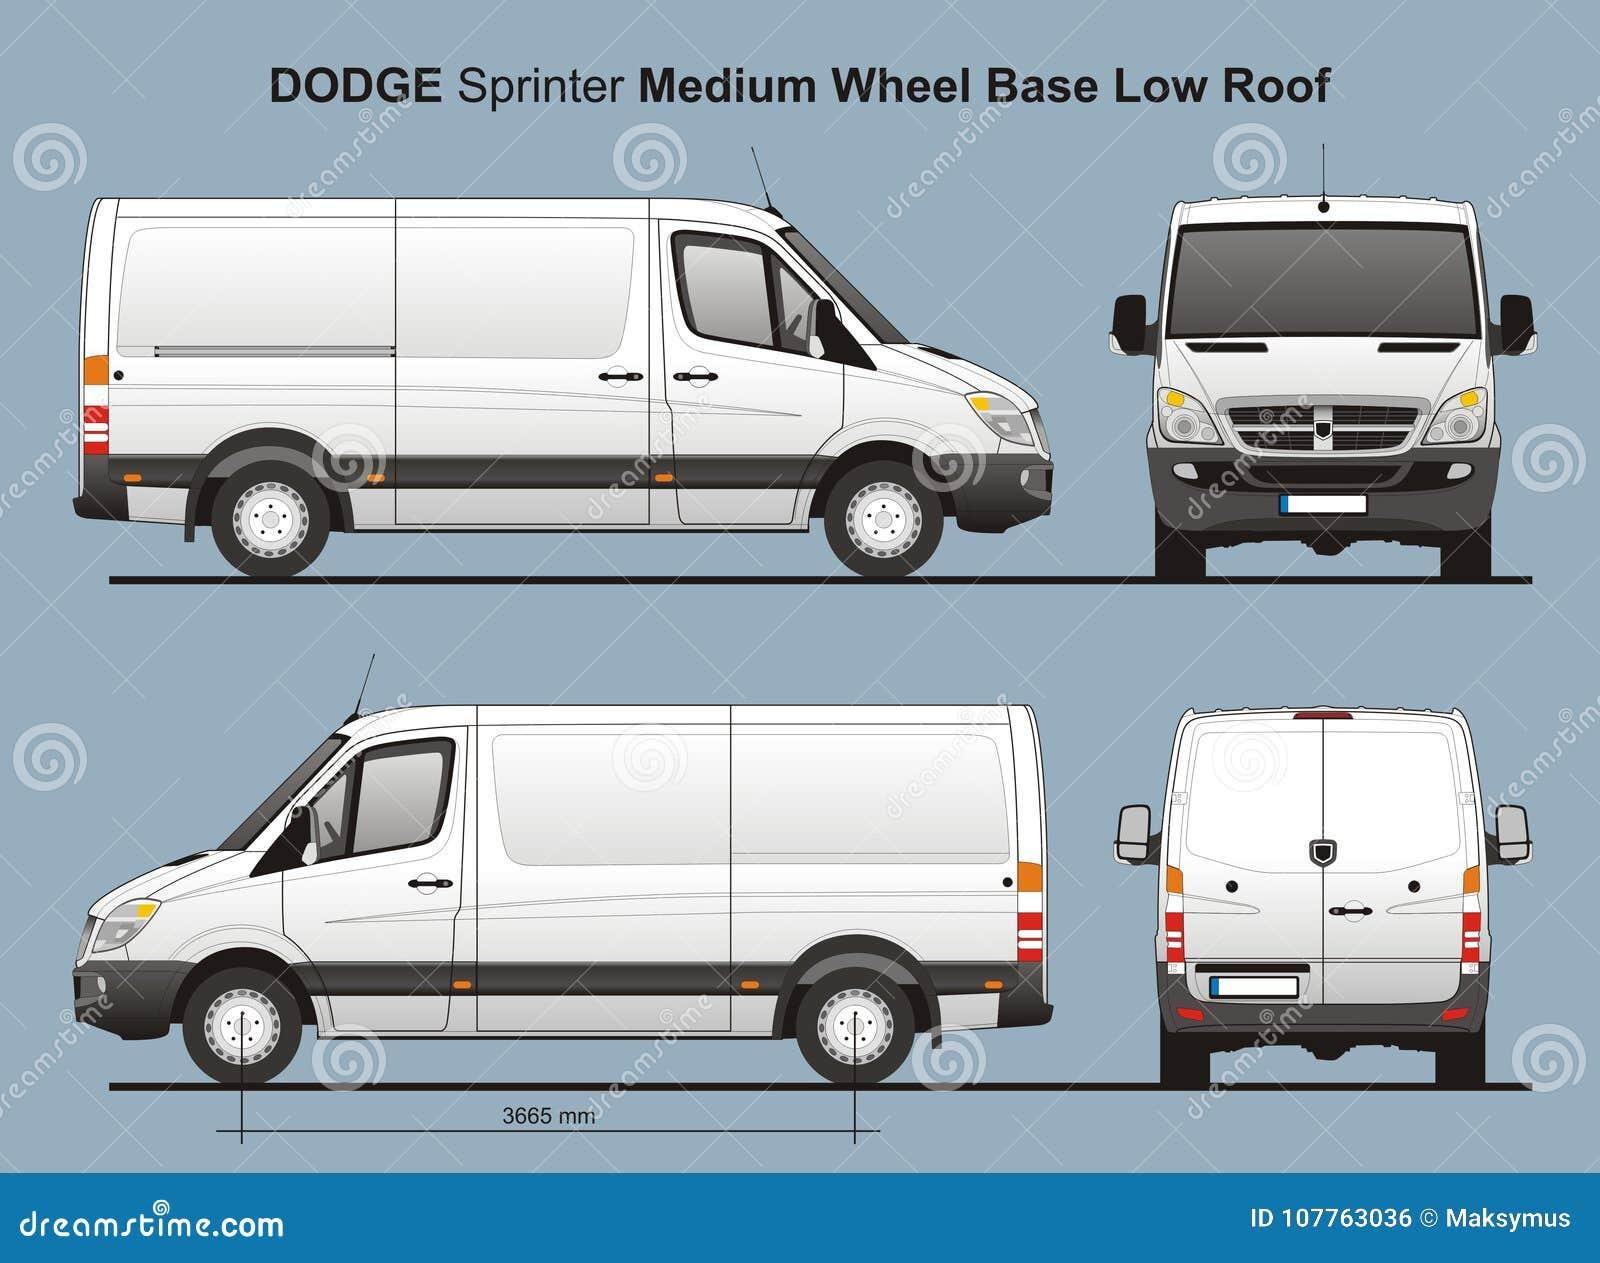 Dodge Sprinter Mwb Low Roof Delivery Van 2010 Editorial Photo